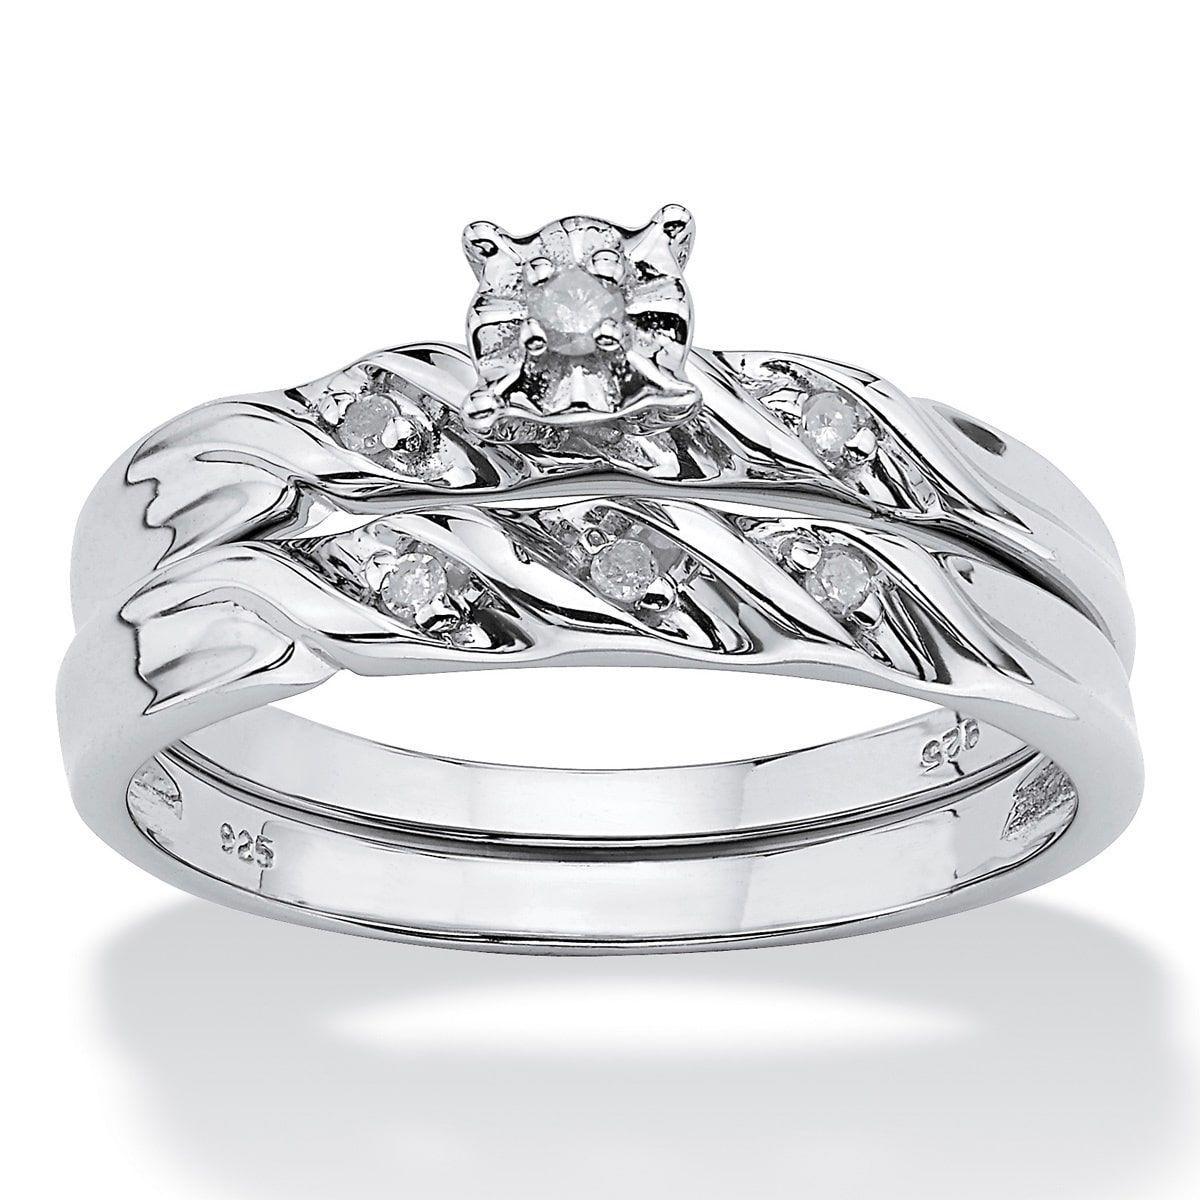 Palm Beach Jewelry Diamond Accent Platinum over Sterling